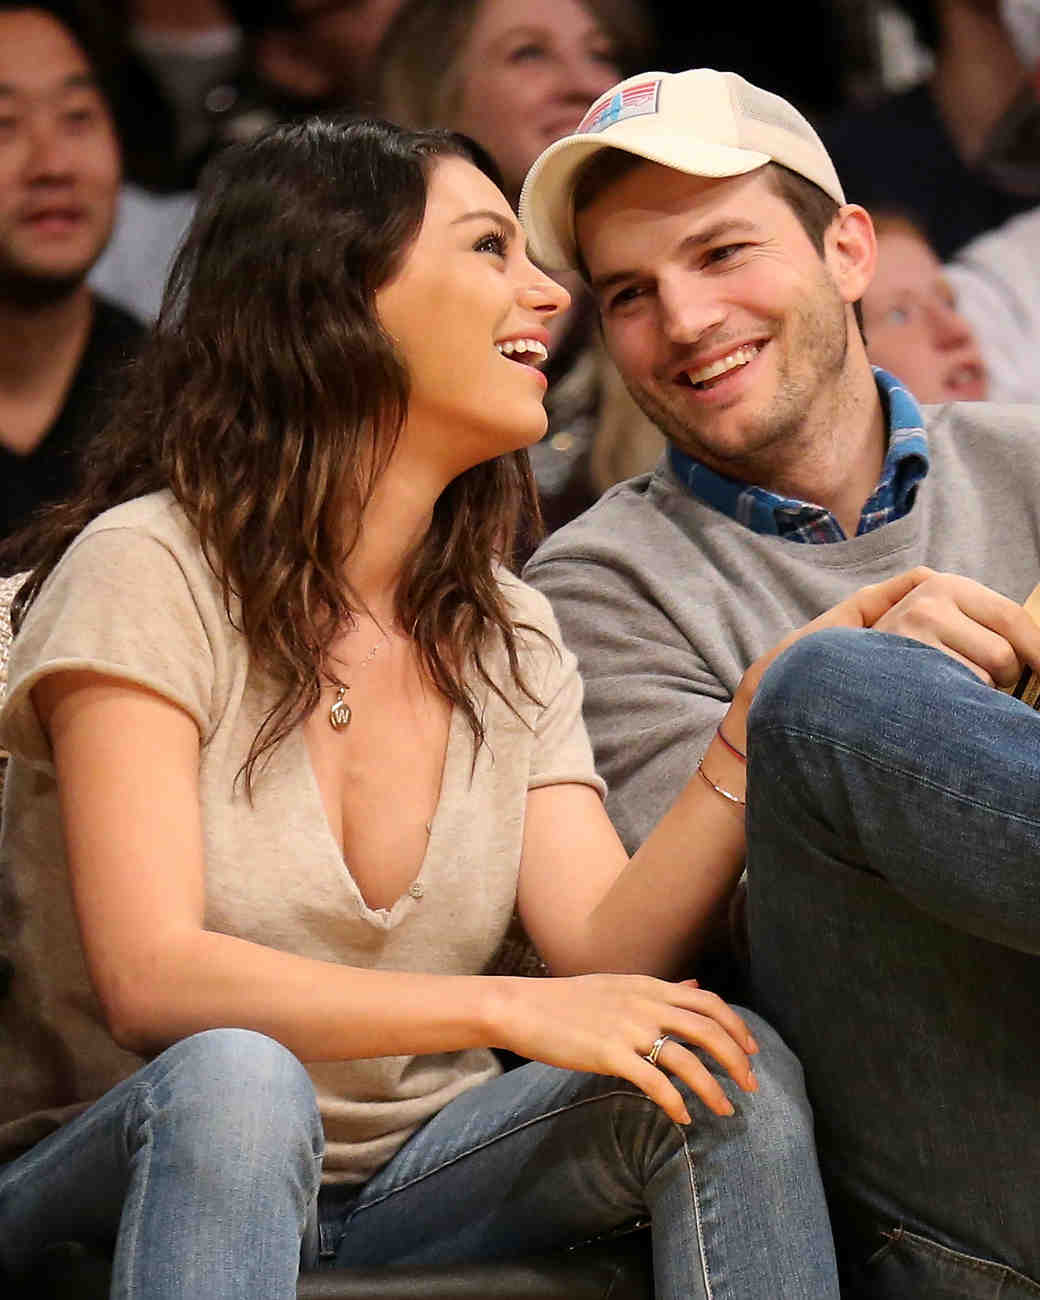 celebrity-wedding-moments-ashton-kutcher-mila-kunis-1215.jpg